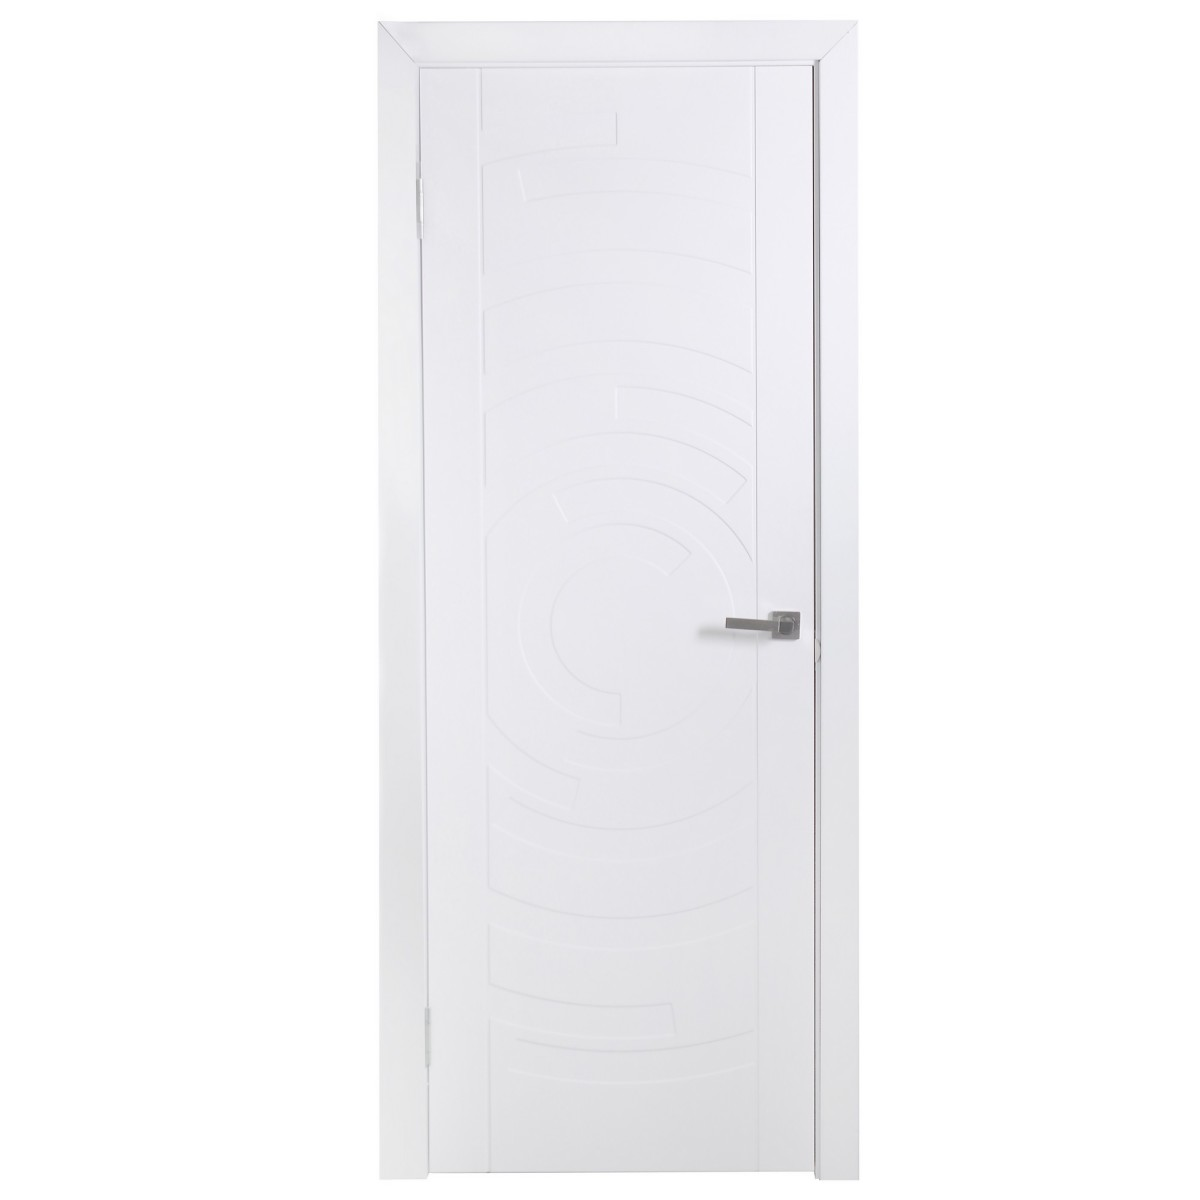 Дверь Межкомнатная Глухая Галактика 70x200 Цвет Белый